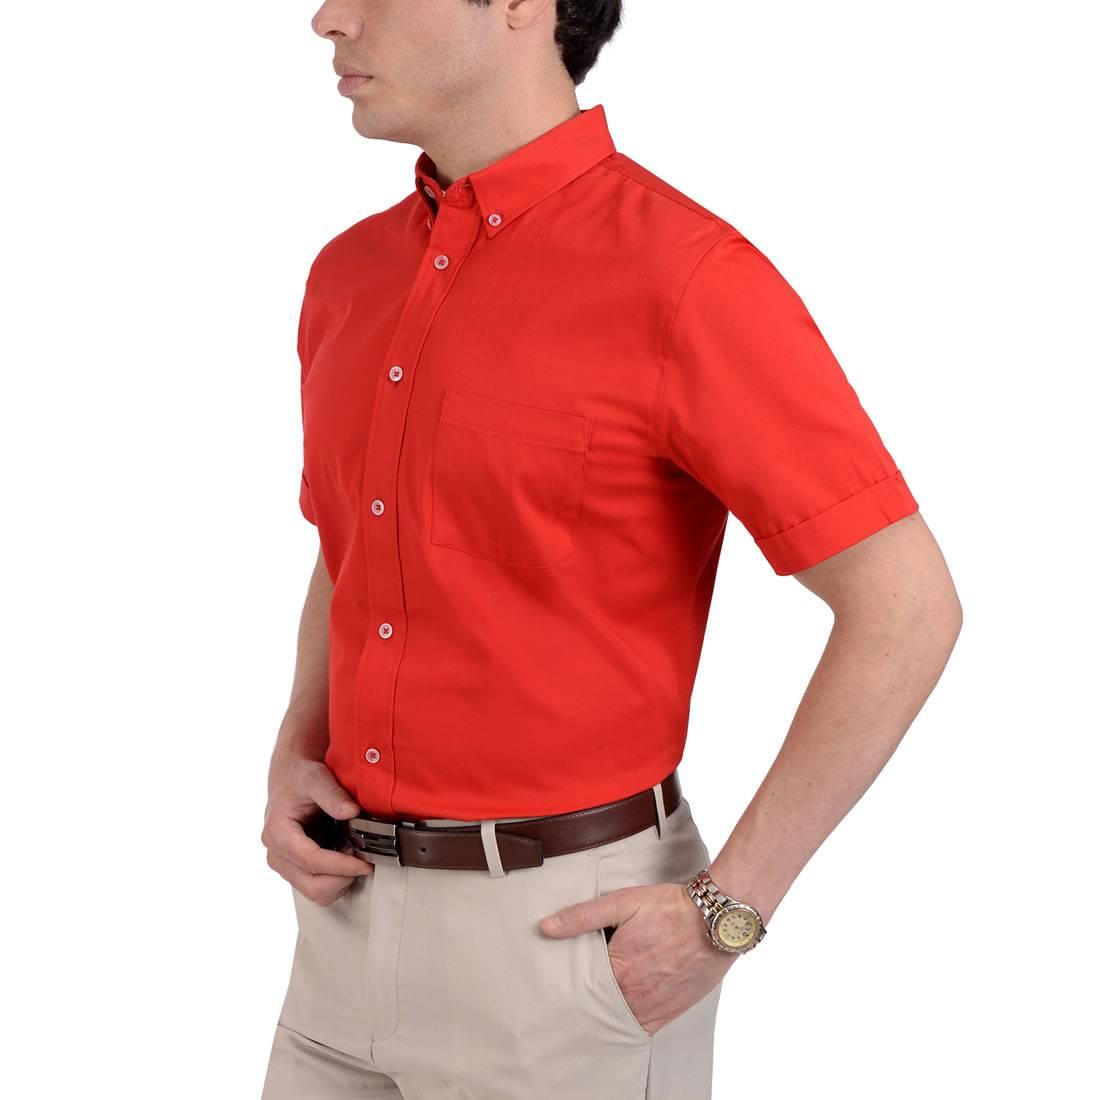 042331381731-02-Camisa-Manga-Corta-classic-Fit-Rojo-yale